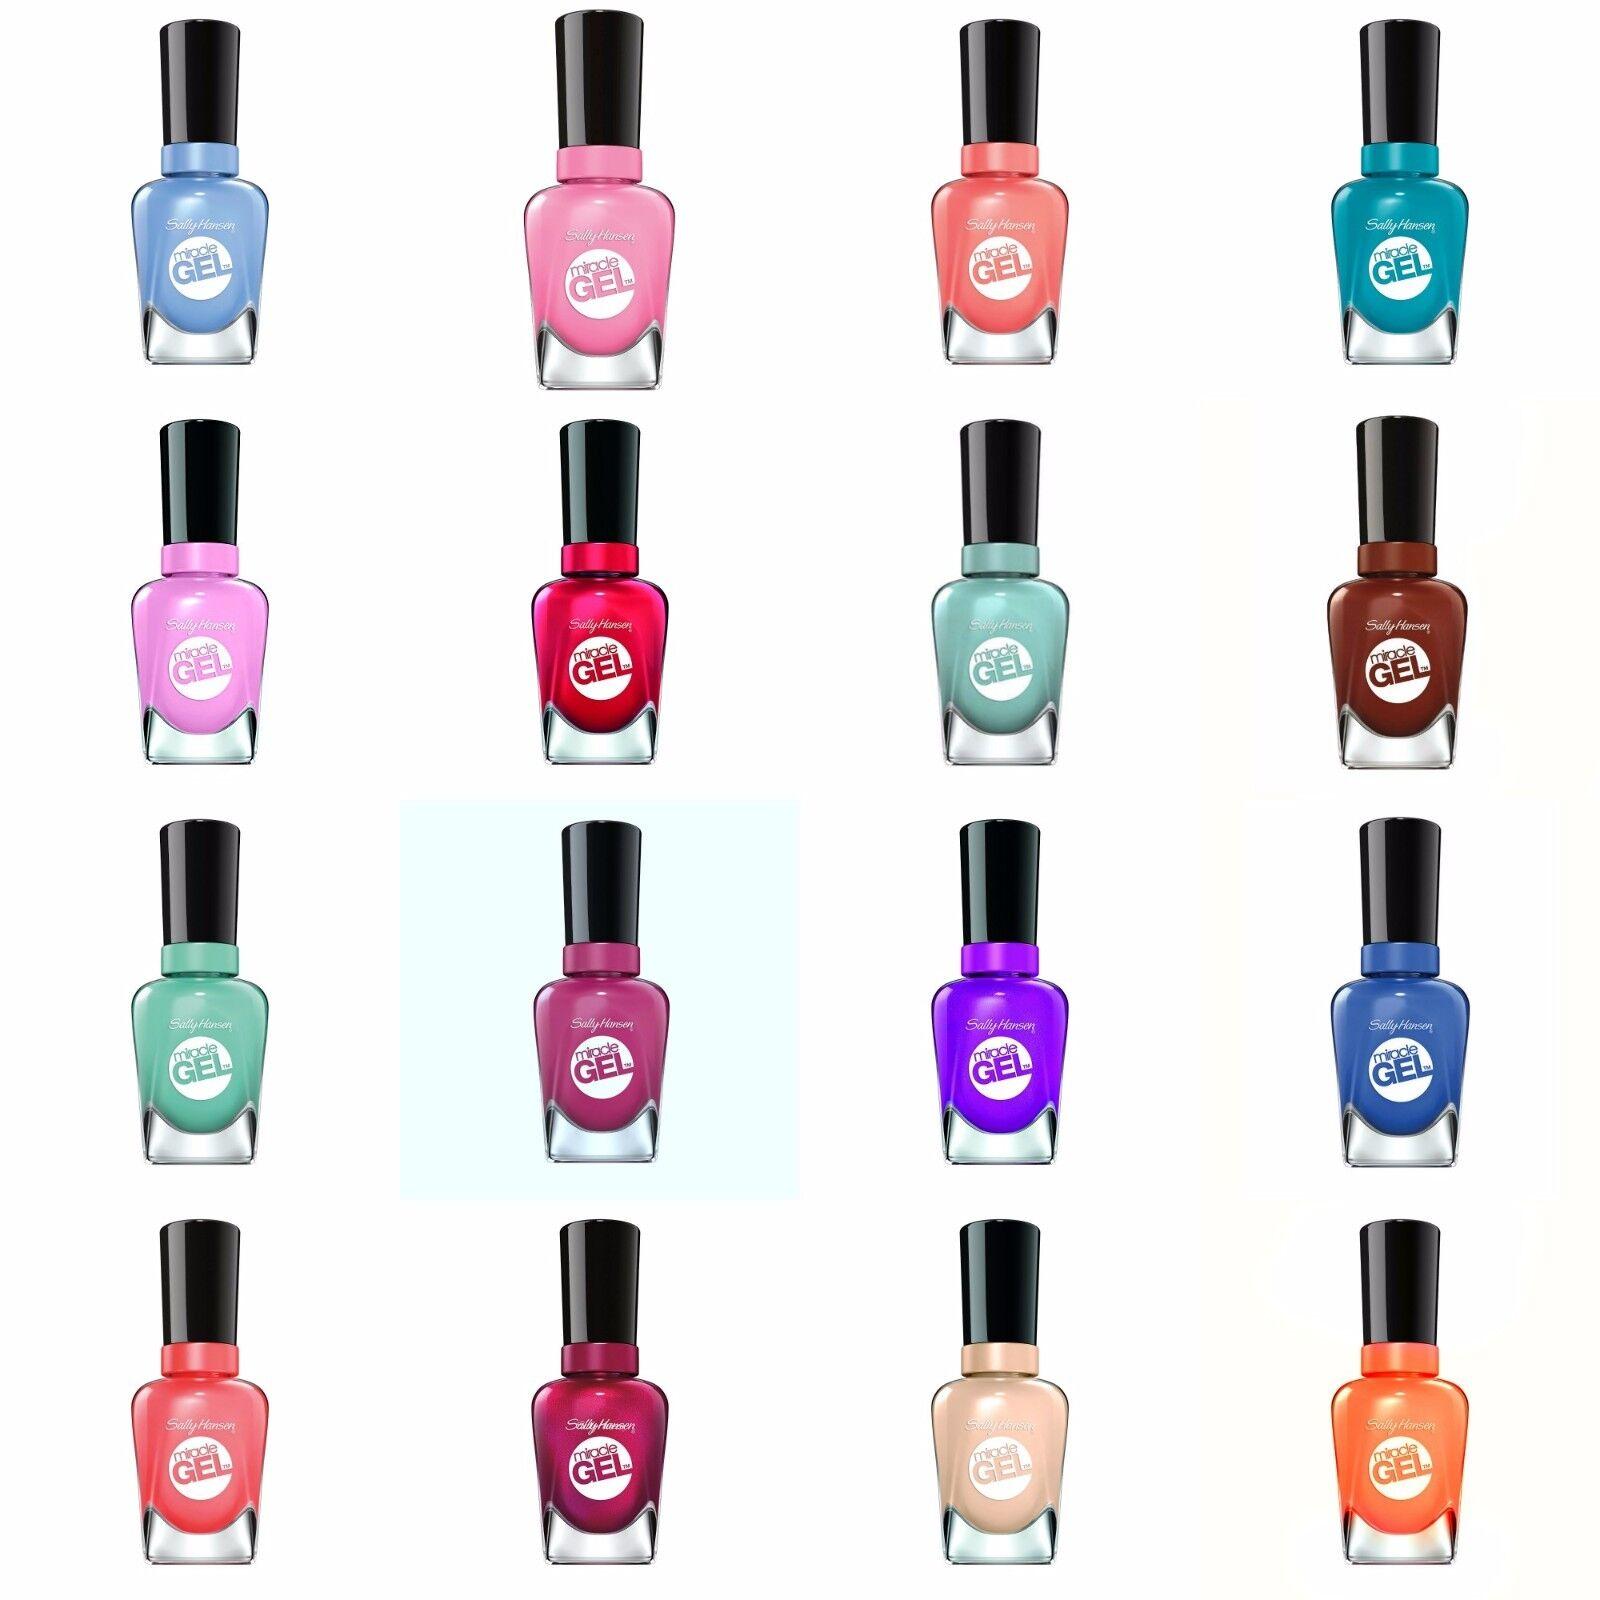 Купить Sally Hansen - Sally Hansen Miracle Gel Nail Polish Lacquer 14.7mL Choose Your Shade New